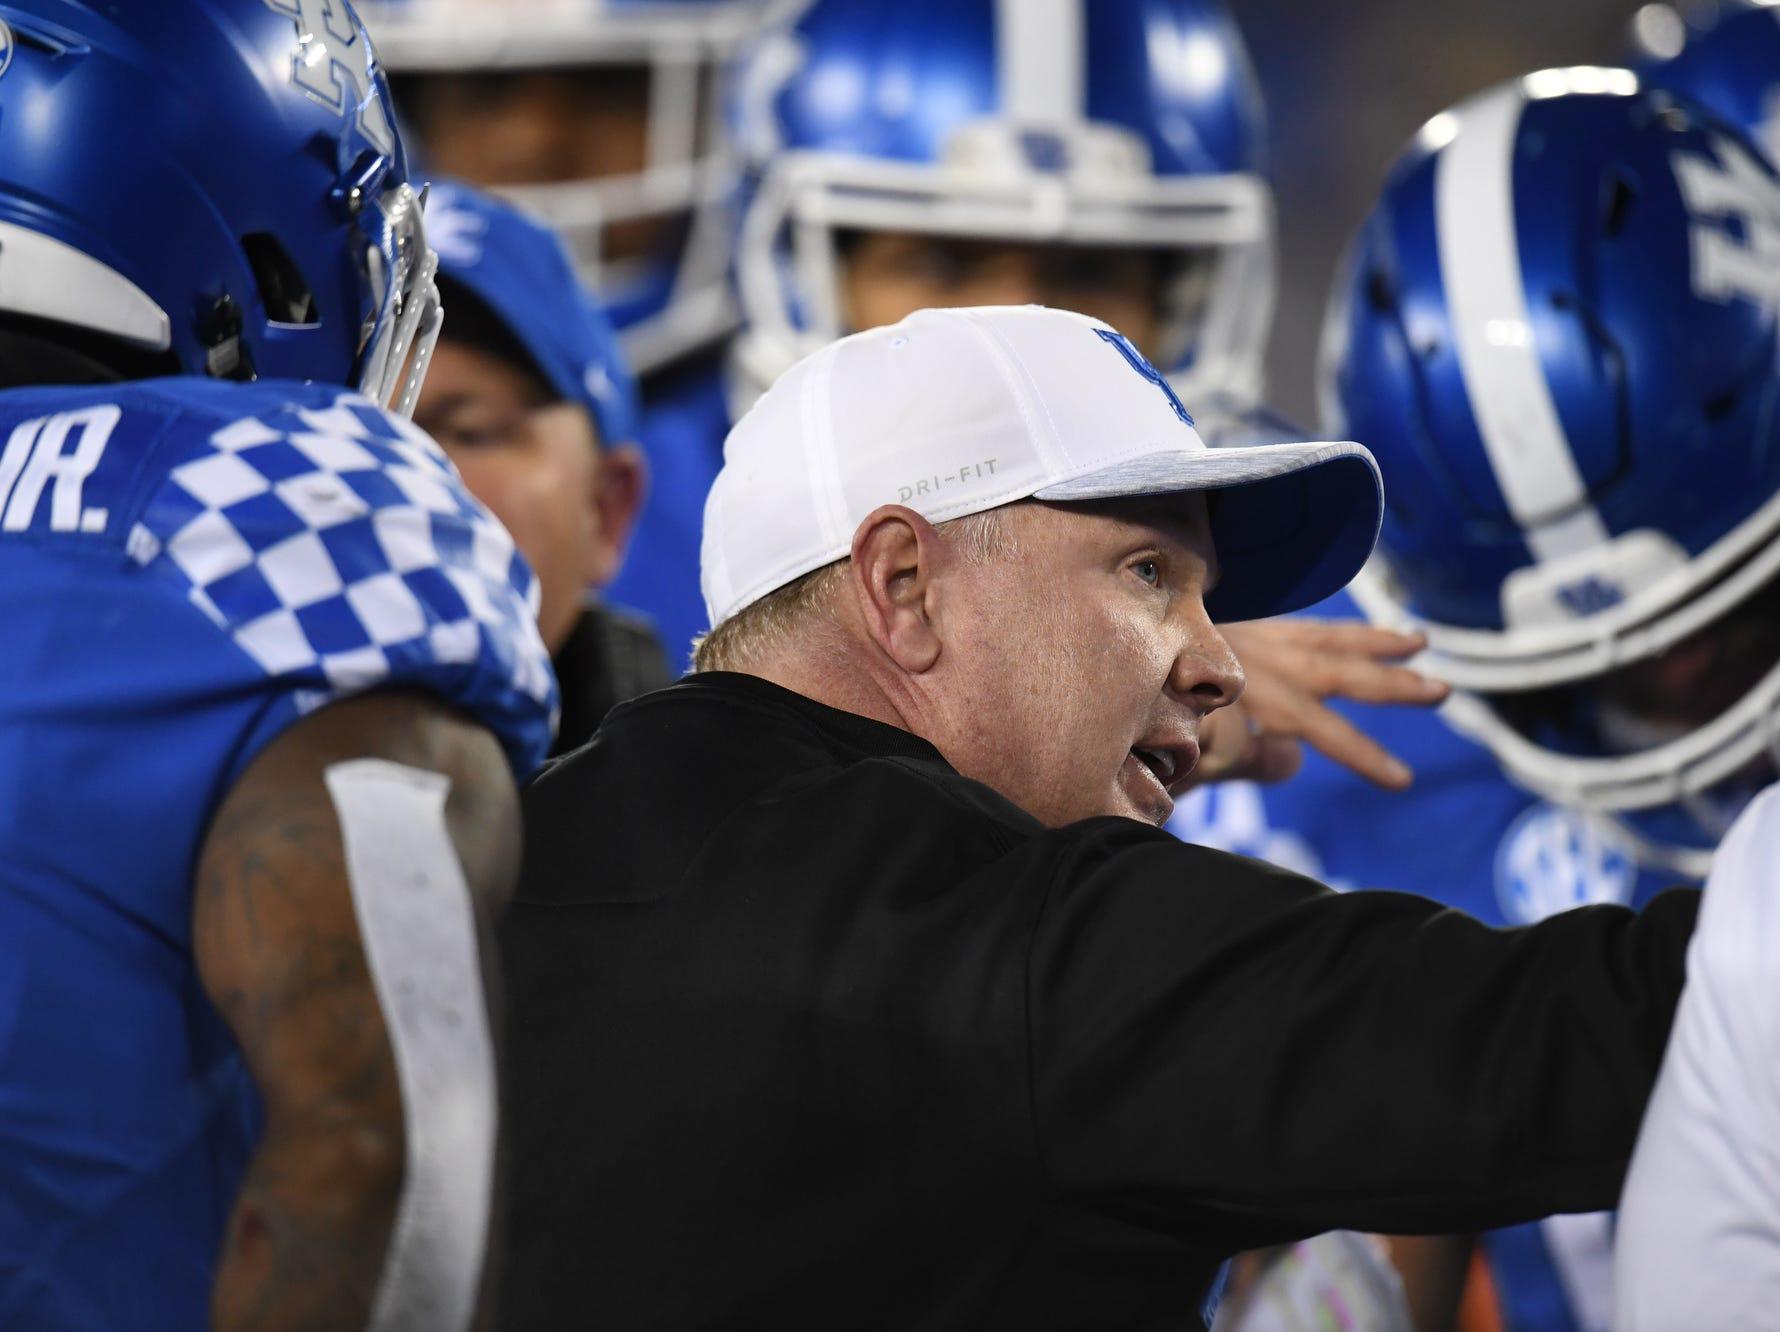 UK head coach Mark Stoops talks to the defense during the University of Kentucky football game against Vanderbilt at Kroger Field in Lexington, Kentucky on Saturday, October 20, 2018.